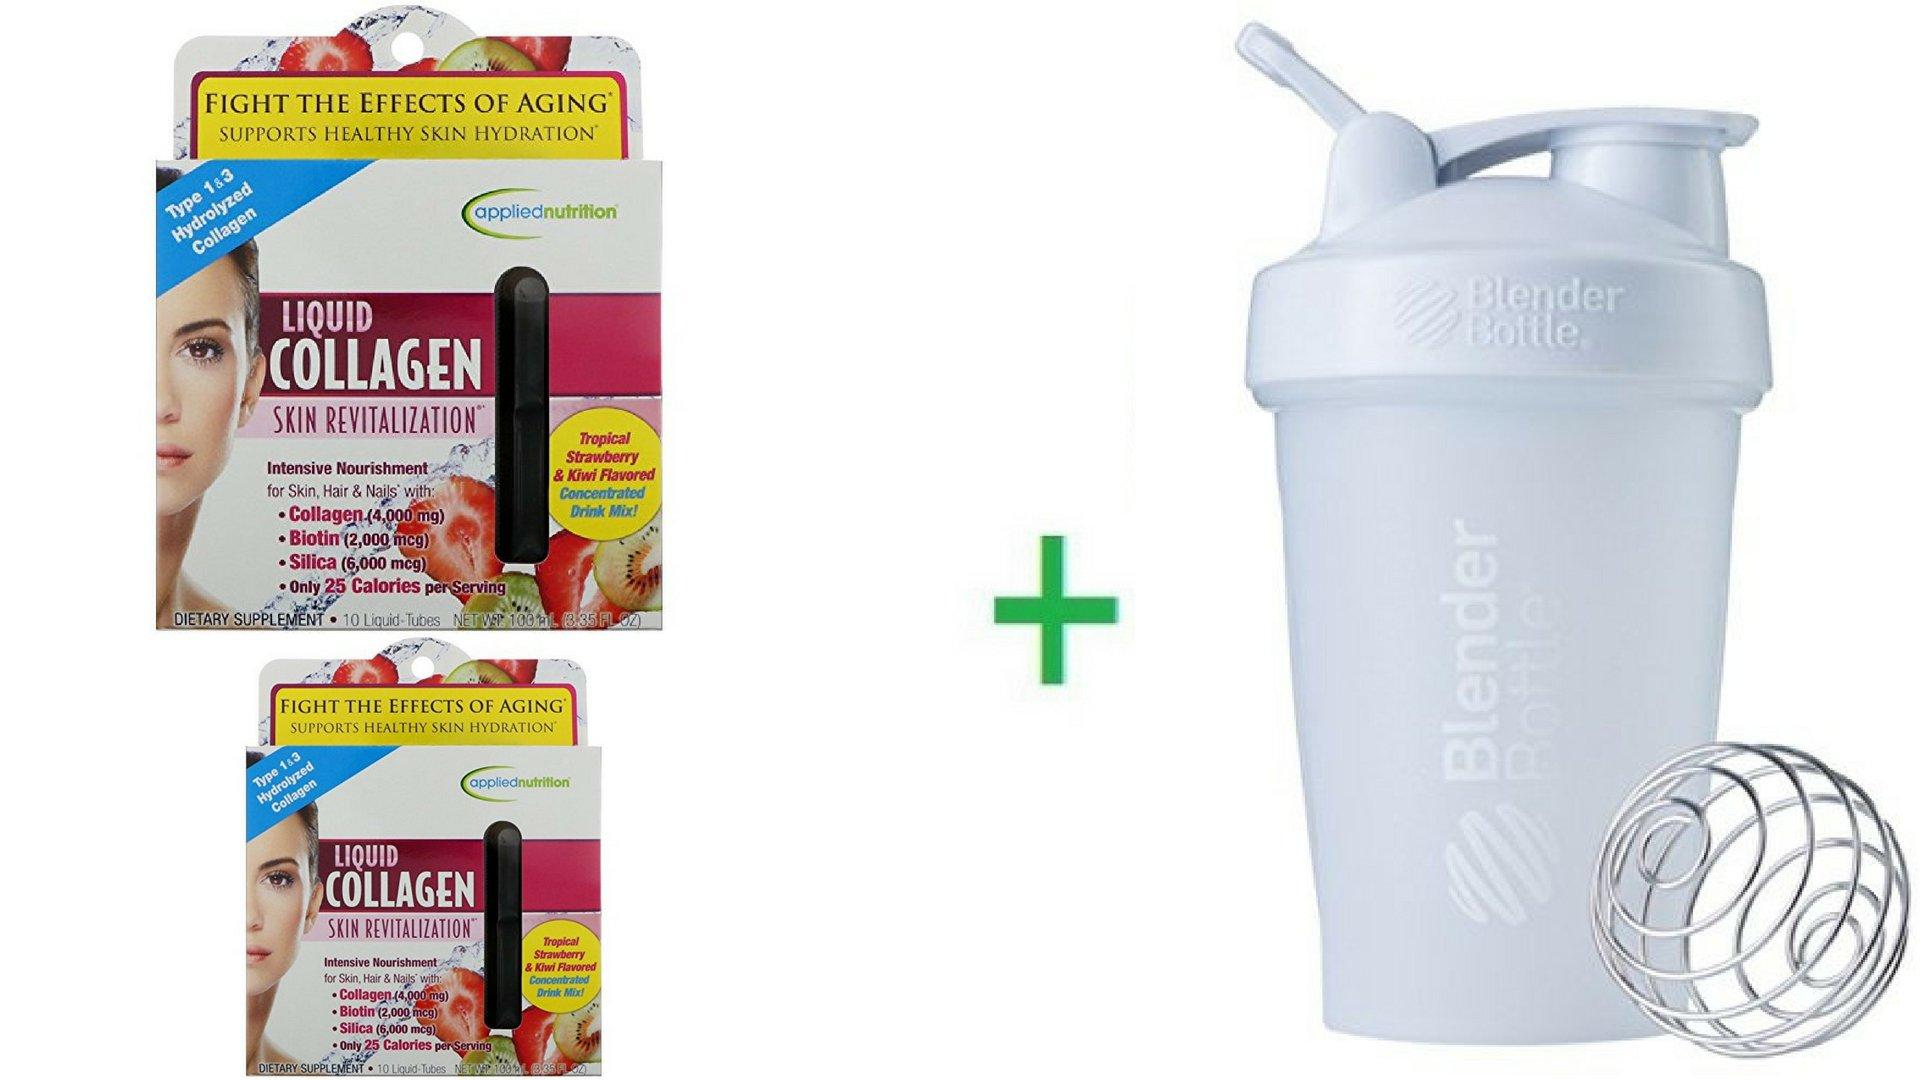 Irwin Naturals, Liquid Collagen, Skin Revitalization, Tropical Strawberry & Kiwi Flavored, 10 Liquid-Tubes, 10 ml Each (2 Packs) + Sundesa, BlenderBottle, Classic With Loop, White, 20 oz